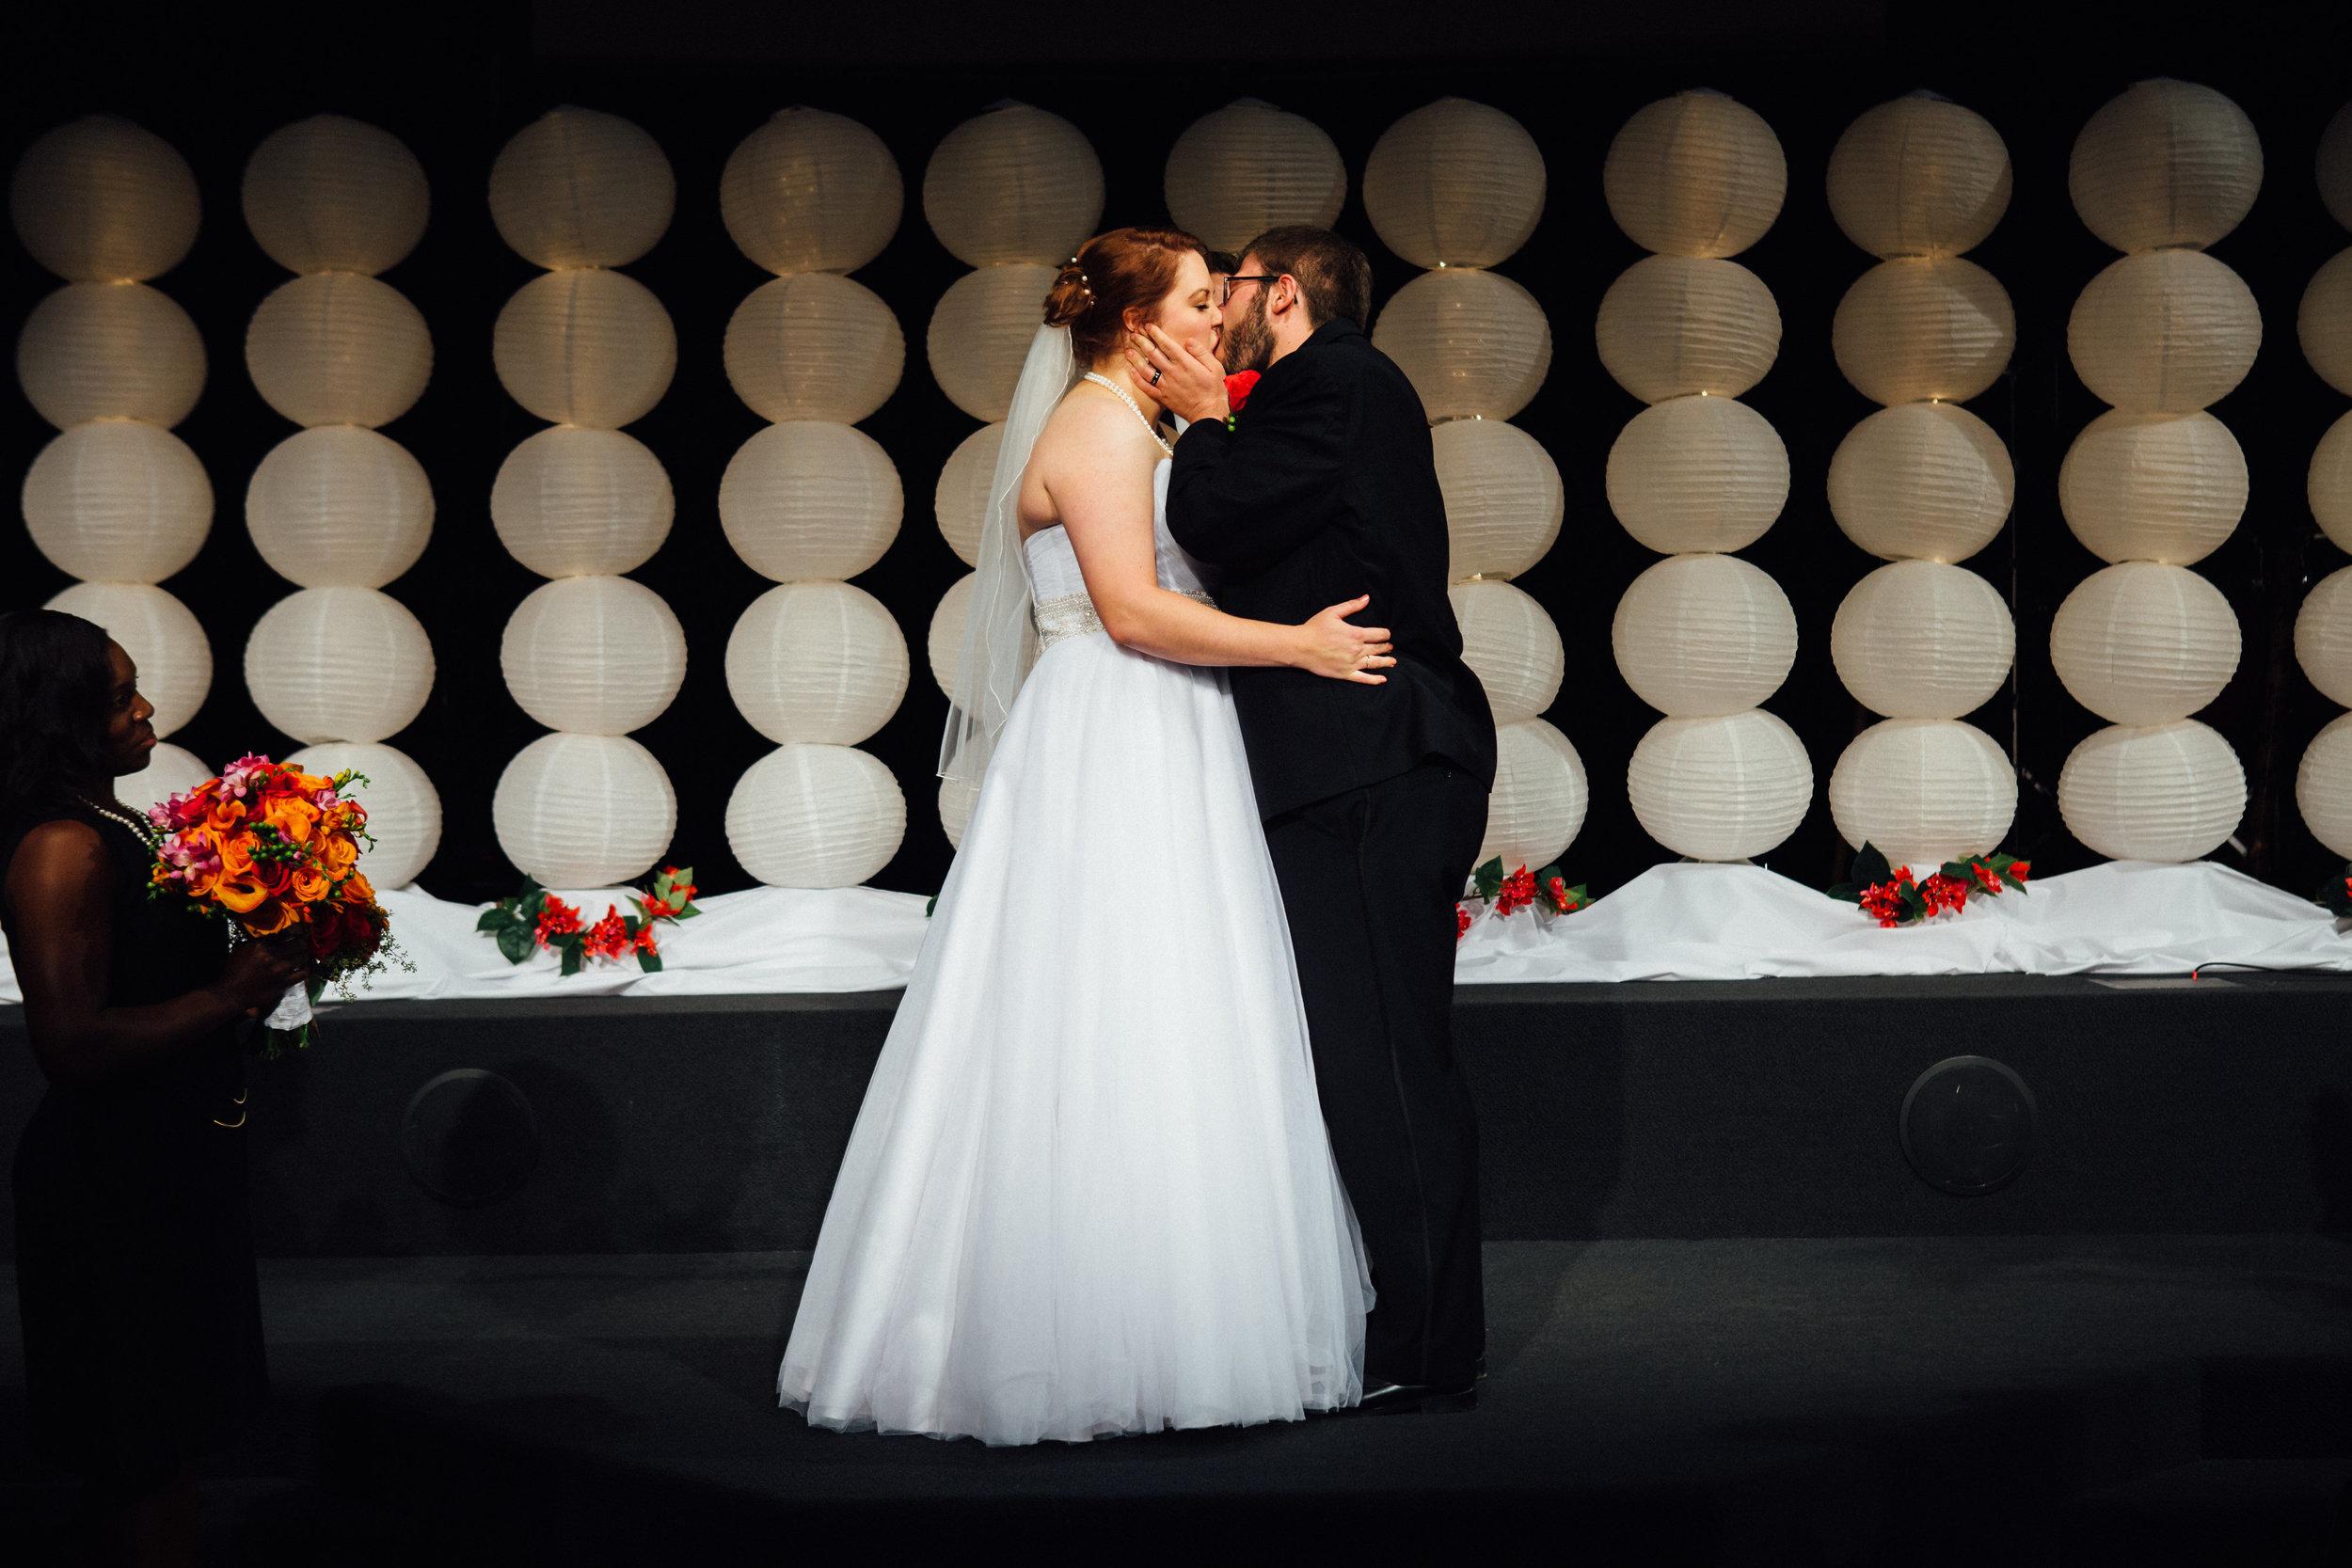 M C Wedding-4 Ceremony-0085.jpg